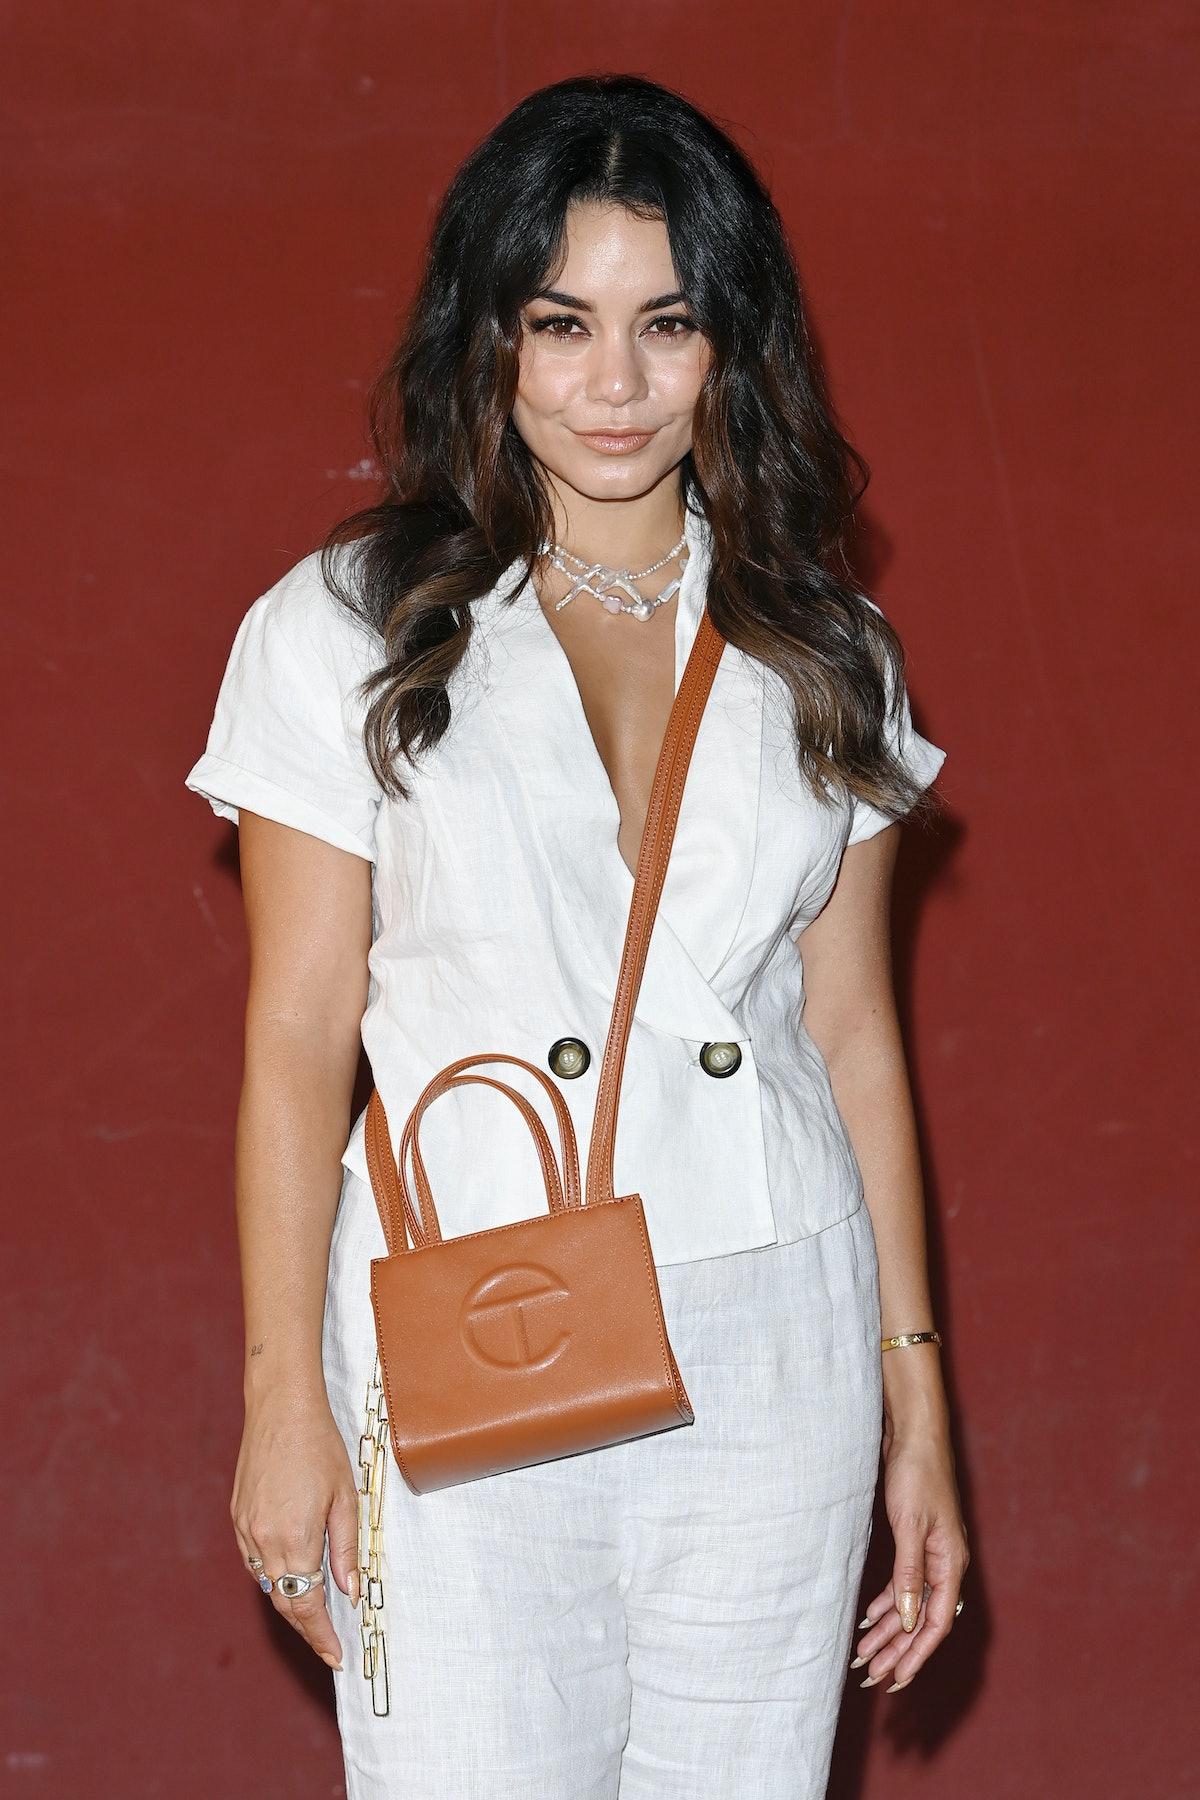 Vanessa Hudgens with a Telfar bag.